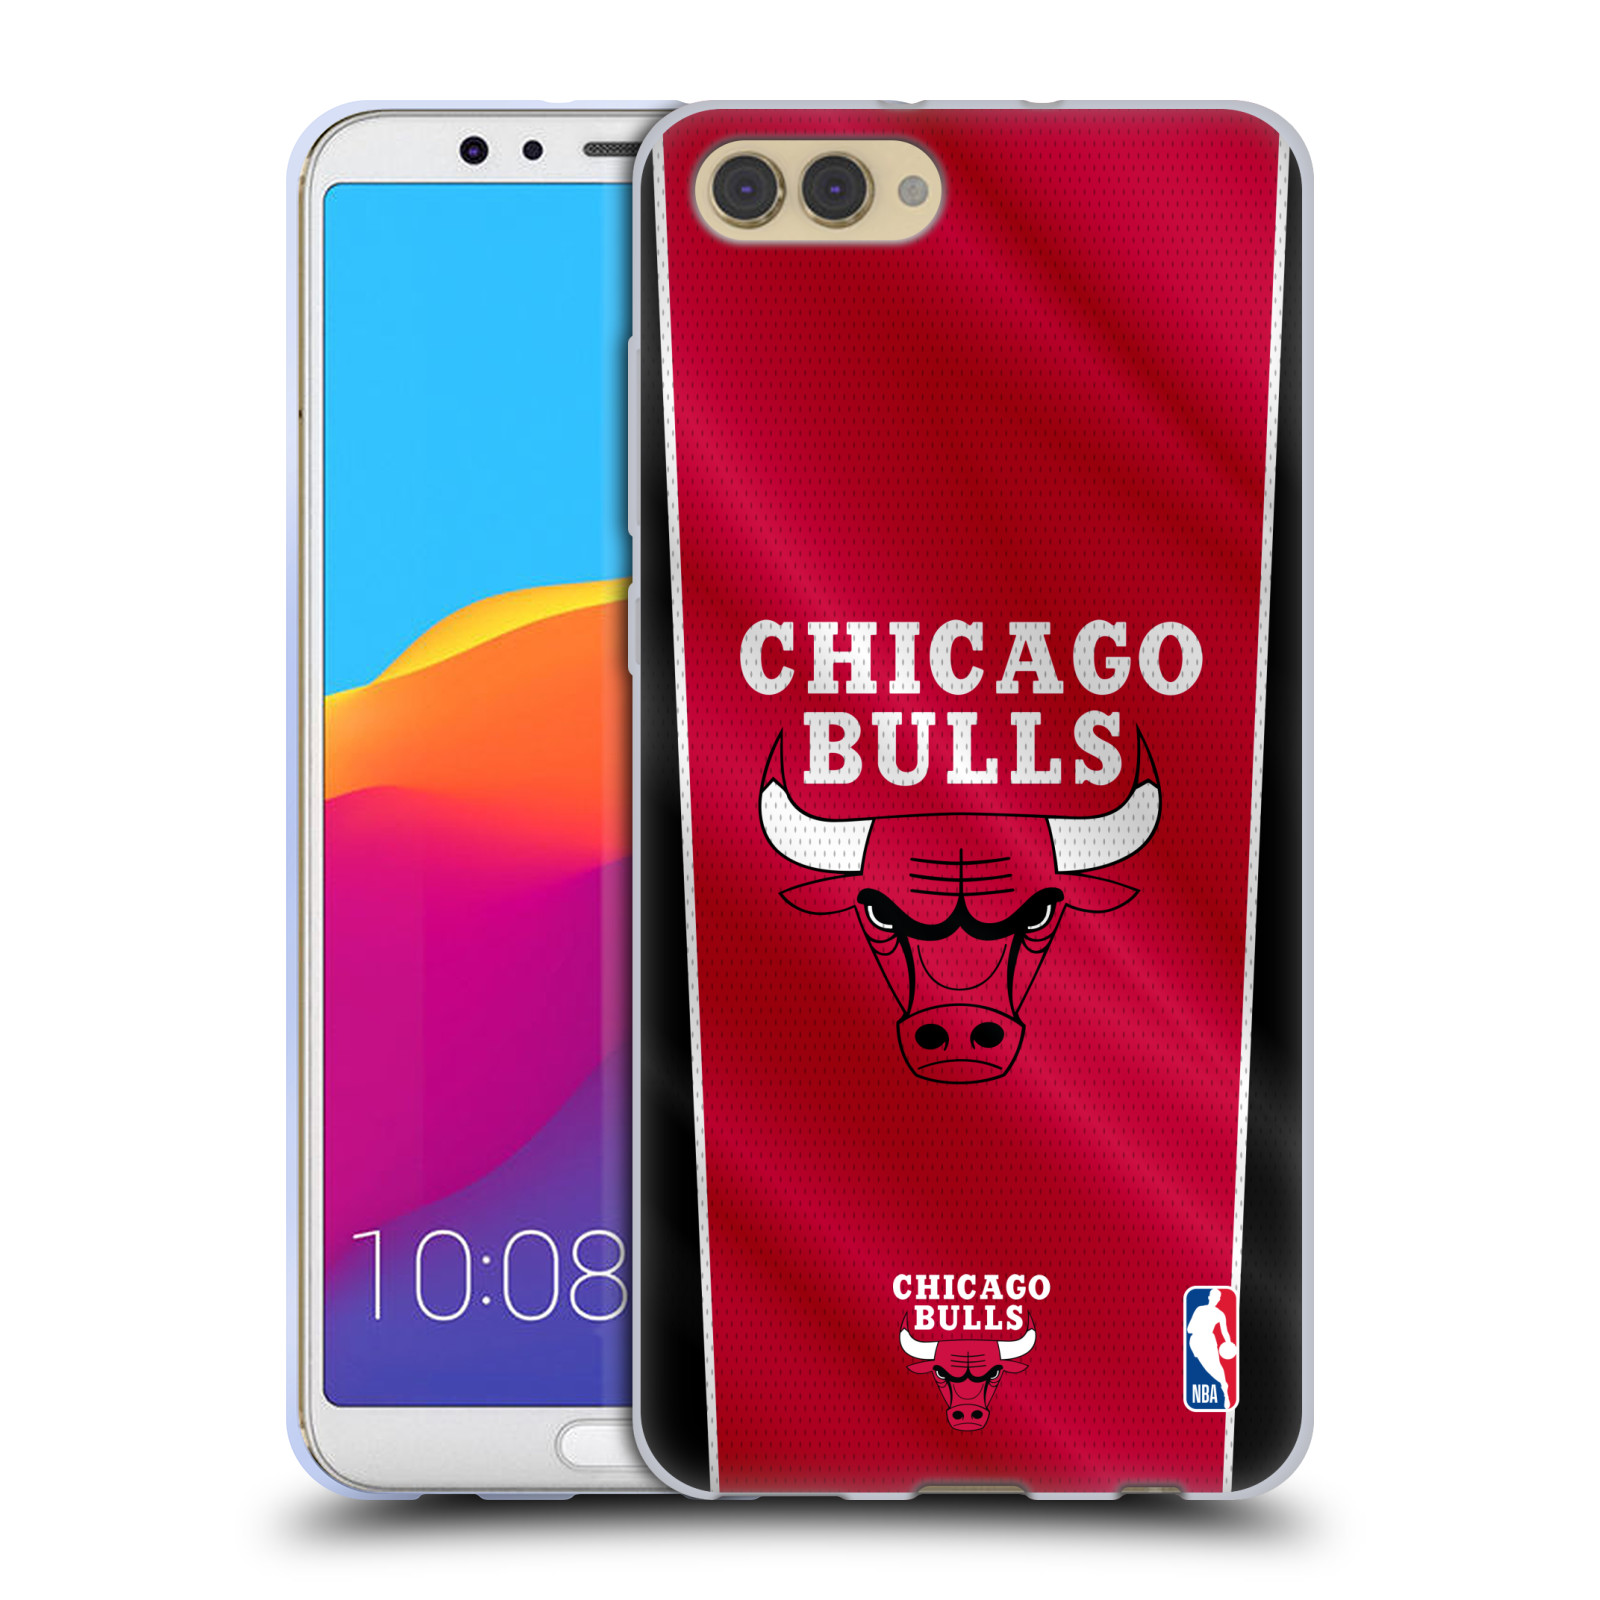 HEAD CASE silikonový obal na mobil Huawei HONOR VIEW 10 / V10 NBA Basketbalový klub Chicago Bulls logo vlajka